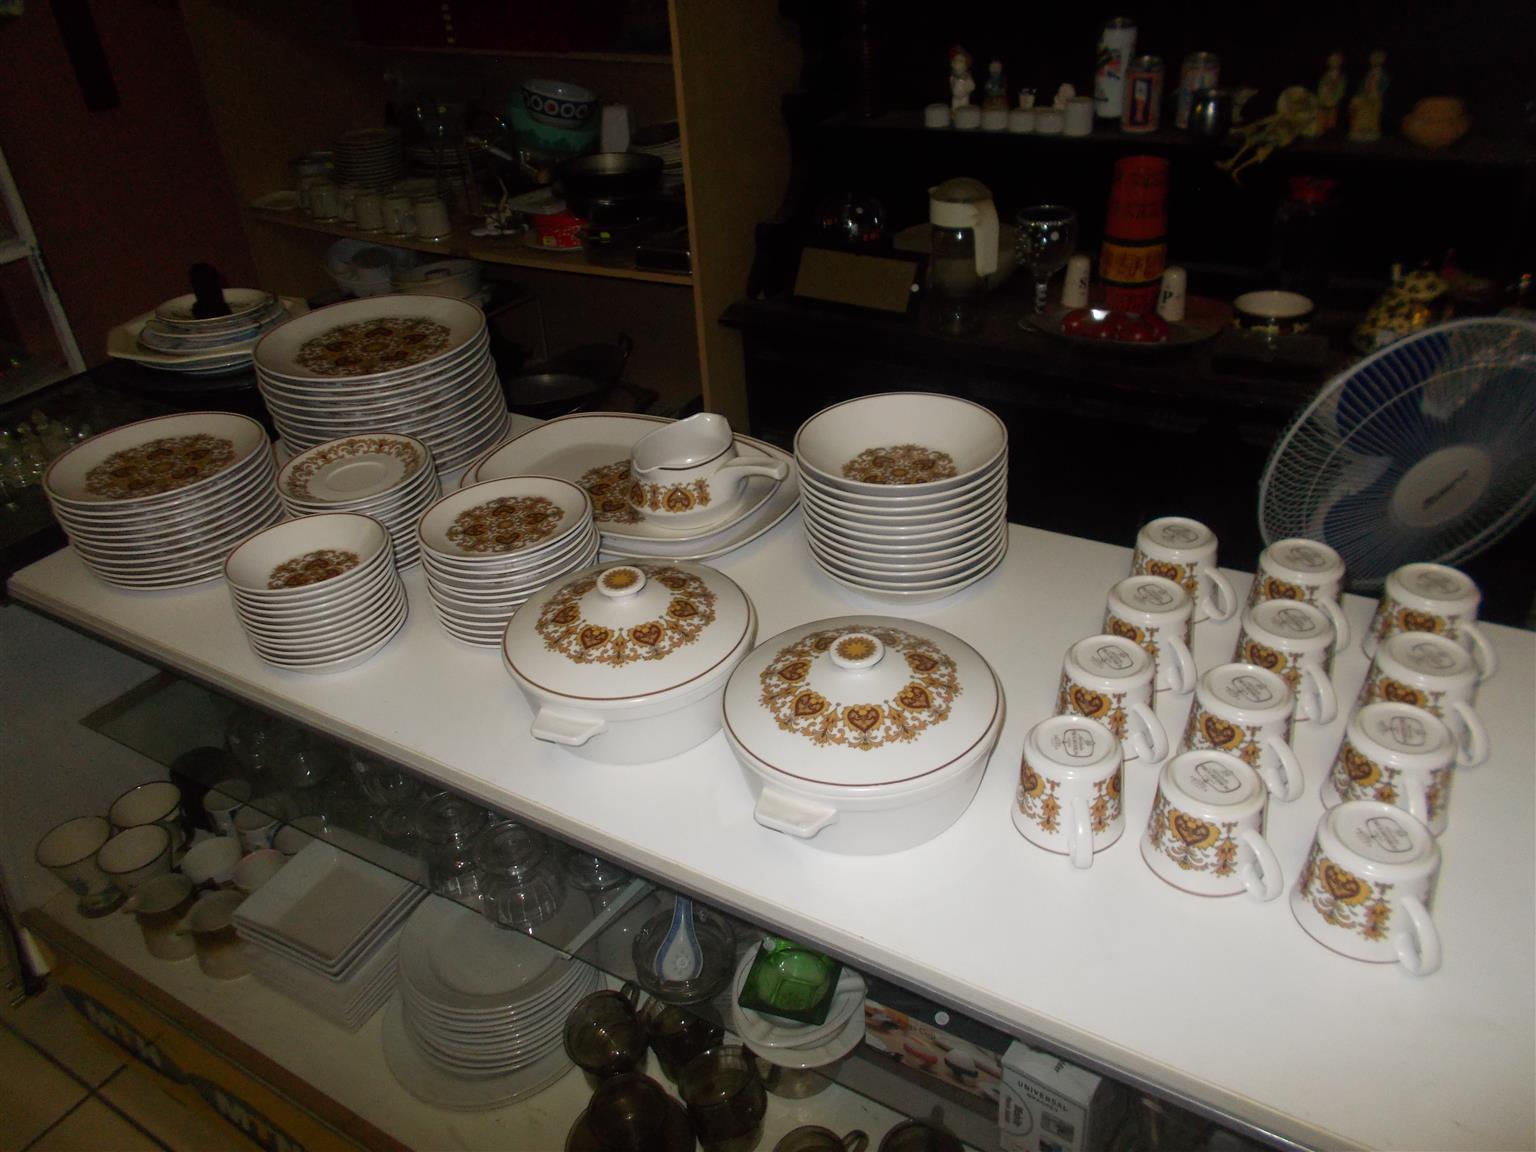 Noritake Dinner Service - 91 Pieces